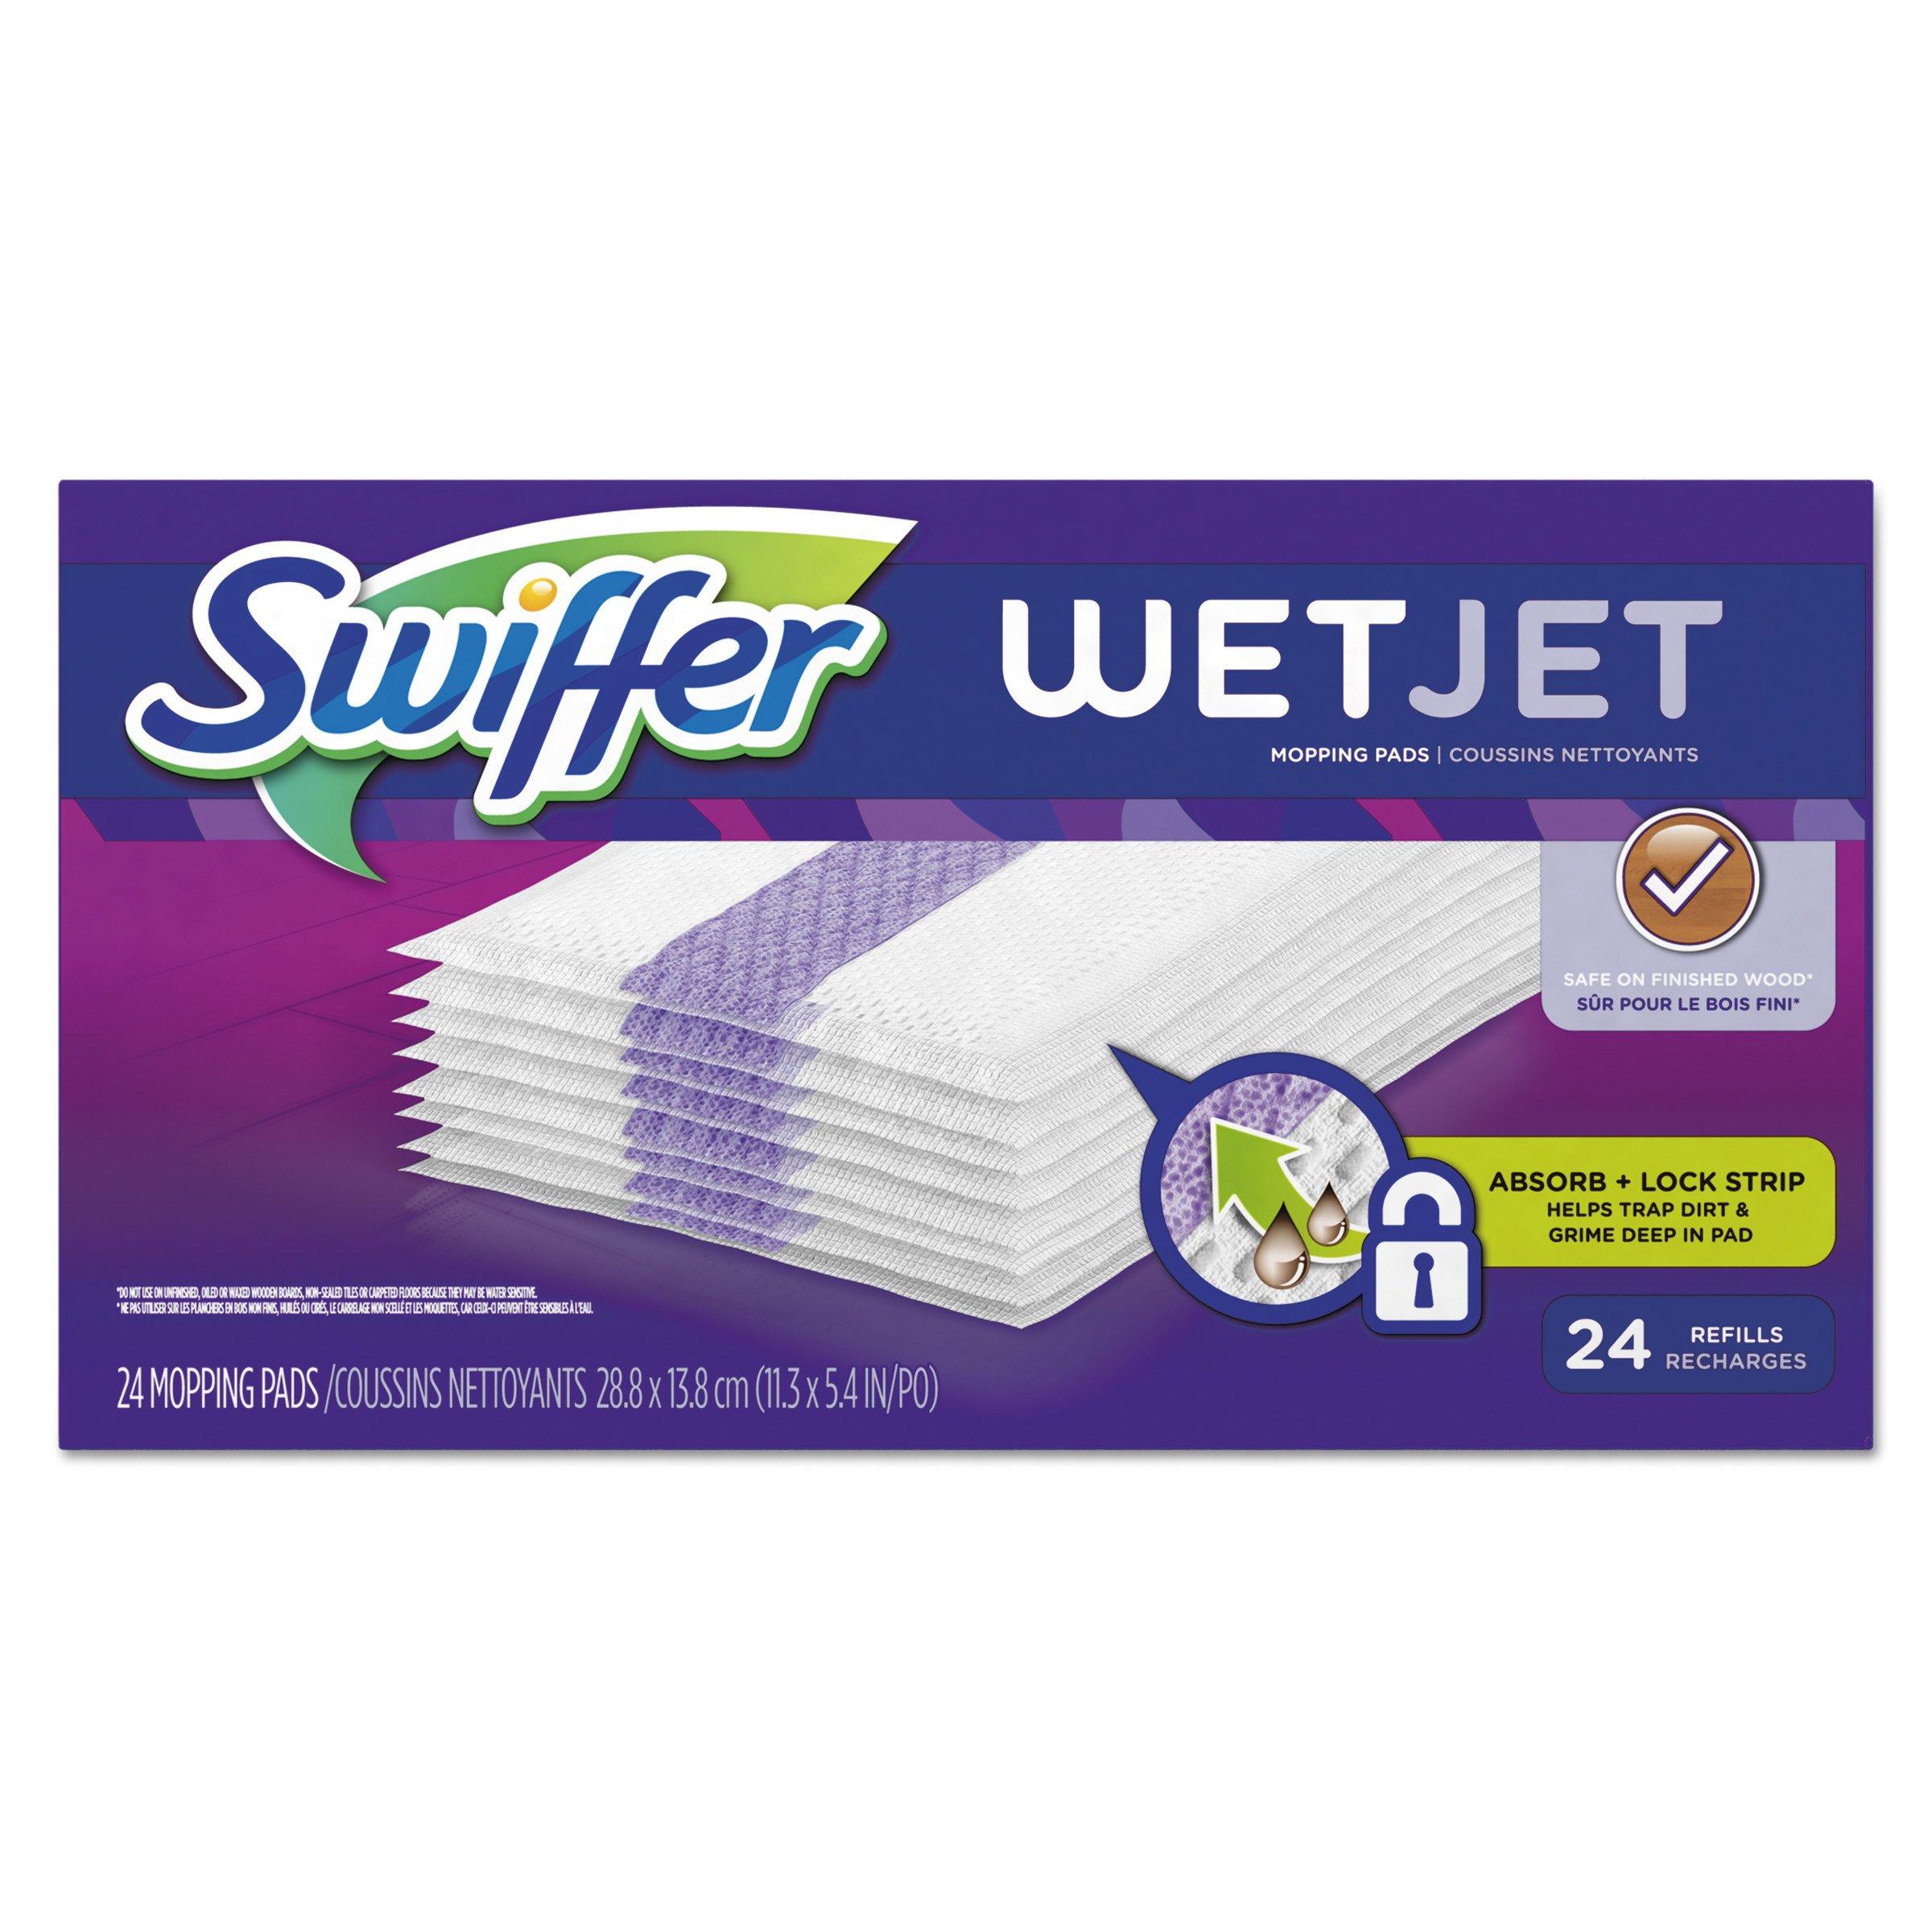 "Swiffer 08443CT WetJet System Refill Cloths, 11.3"" x 5.4"", White, 24 per Box"